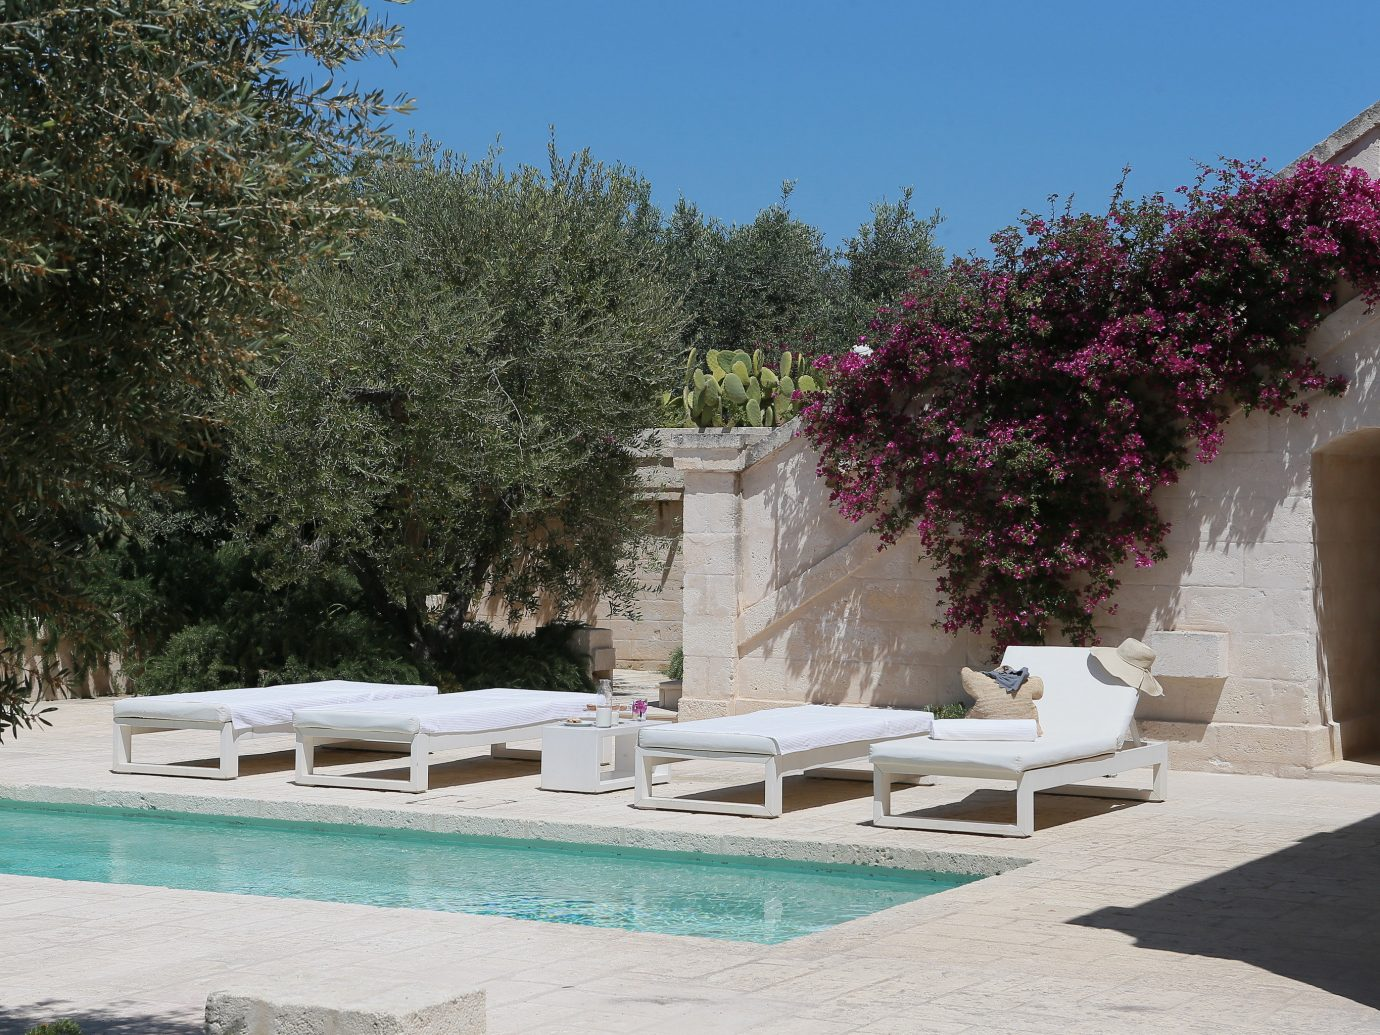 tree outdoor property swimming pool estate house backyard Villa Courtyard home yard Garden hacienda